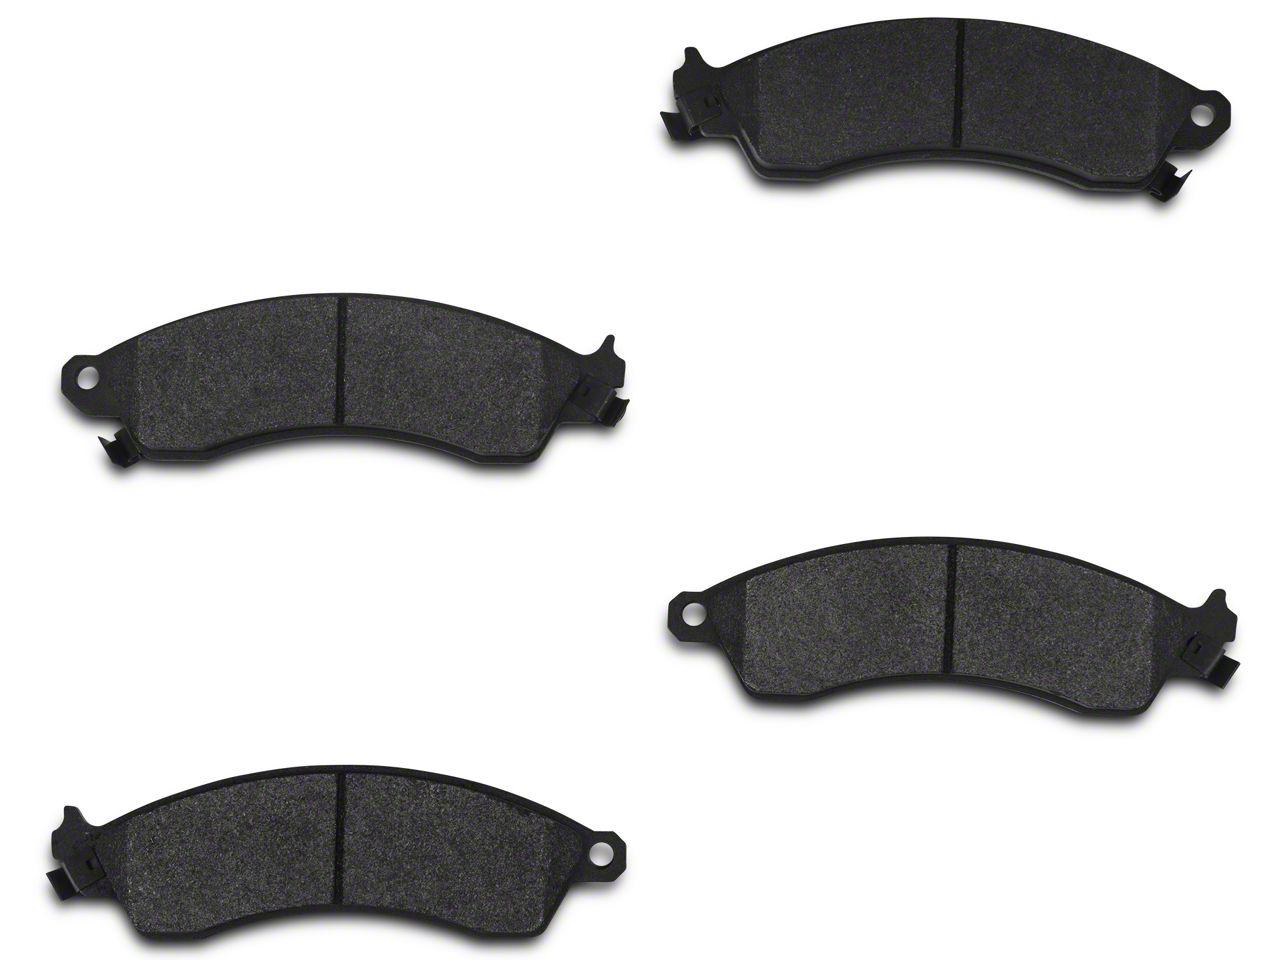 Xtreme Stop Carbon Graphite Brake Pads - Front Pair (94-04 Cobra, Bullitt, Mach 1)